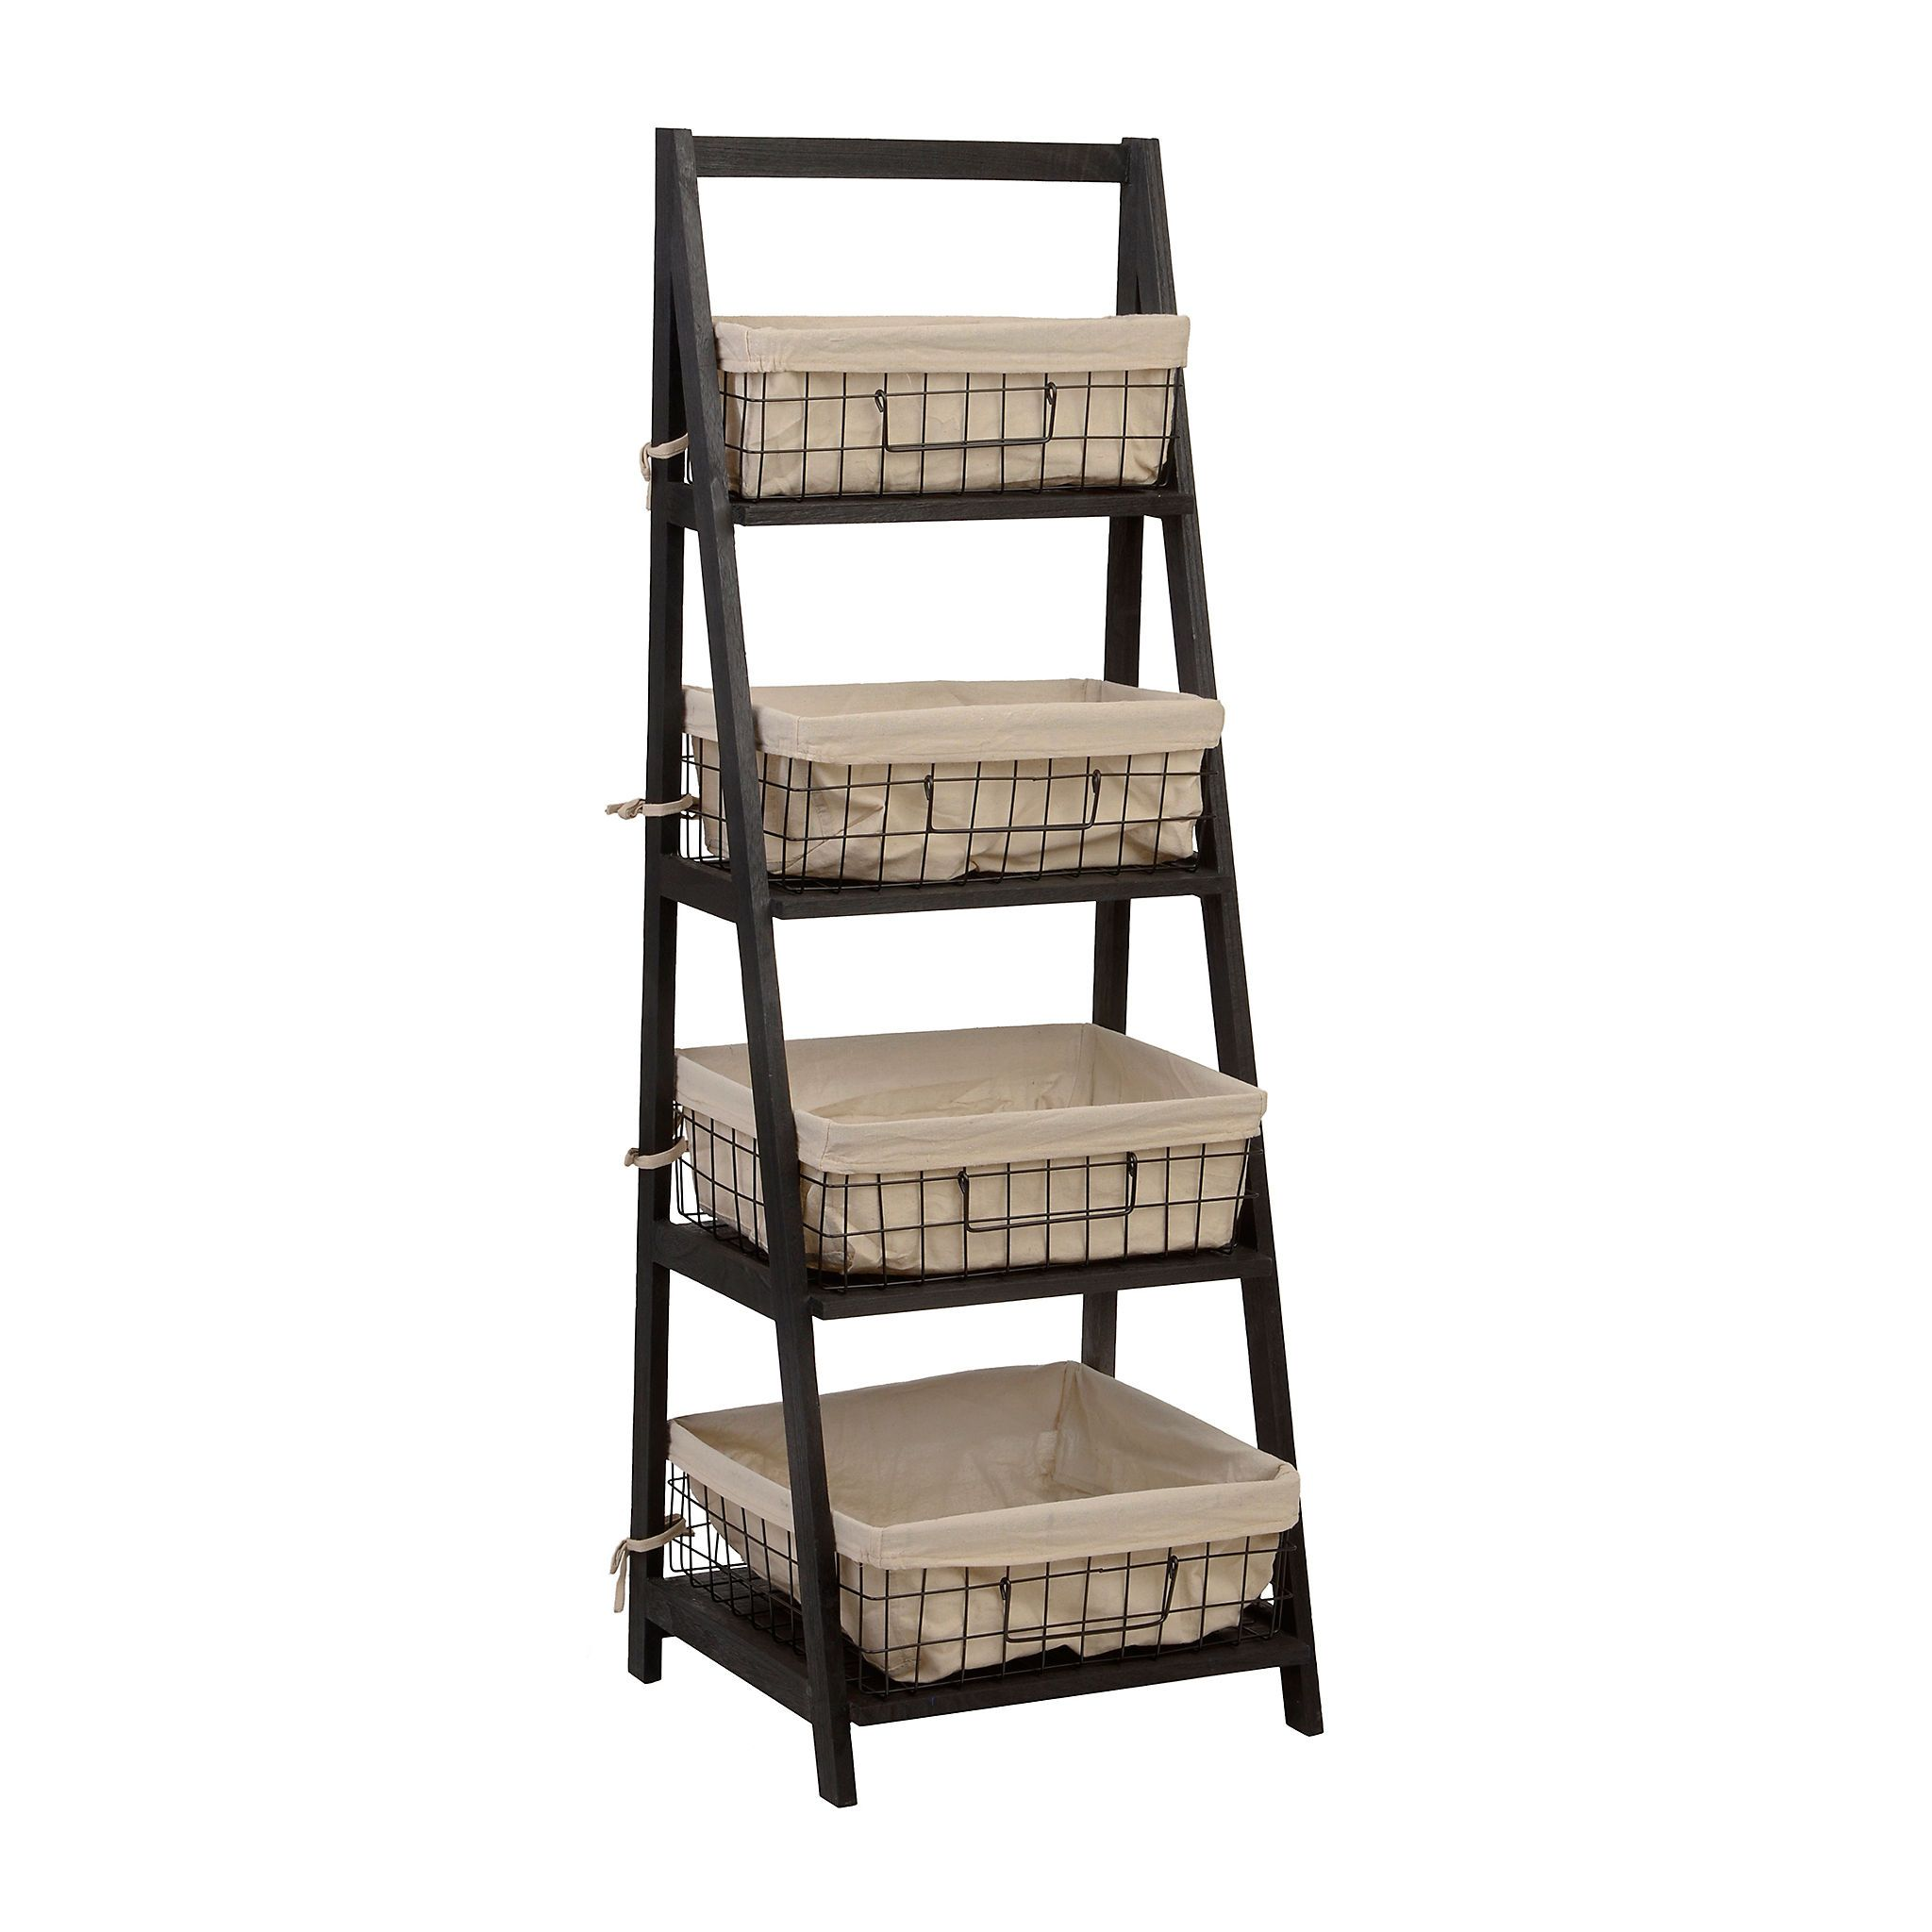 Kirkland S Wooden Ladder Shelf Storage Baskets Ladder Shelf